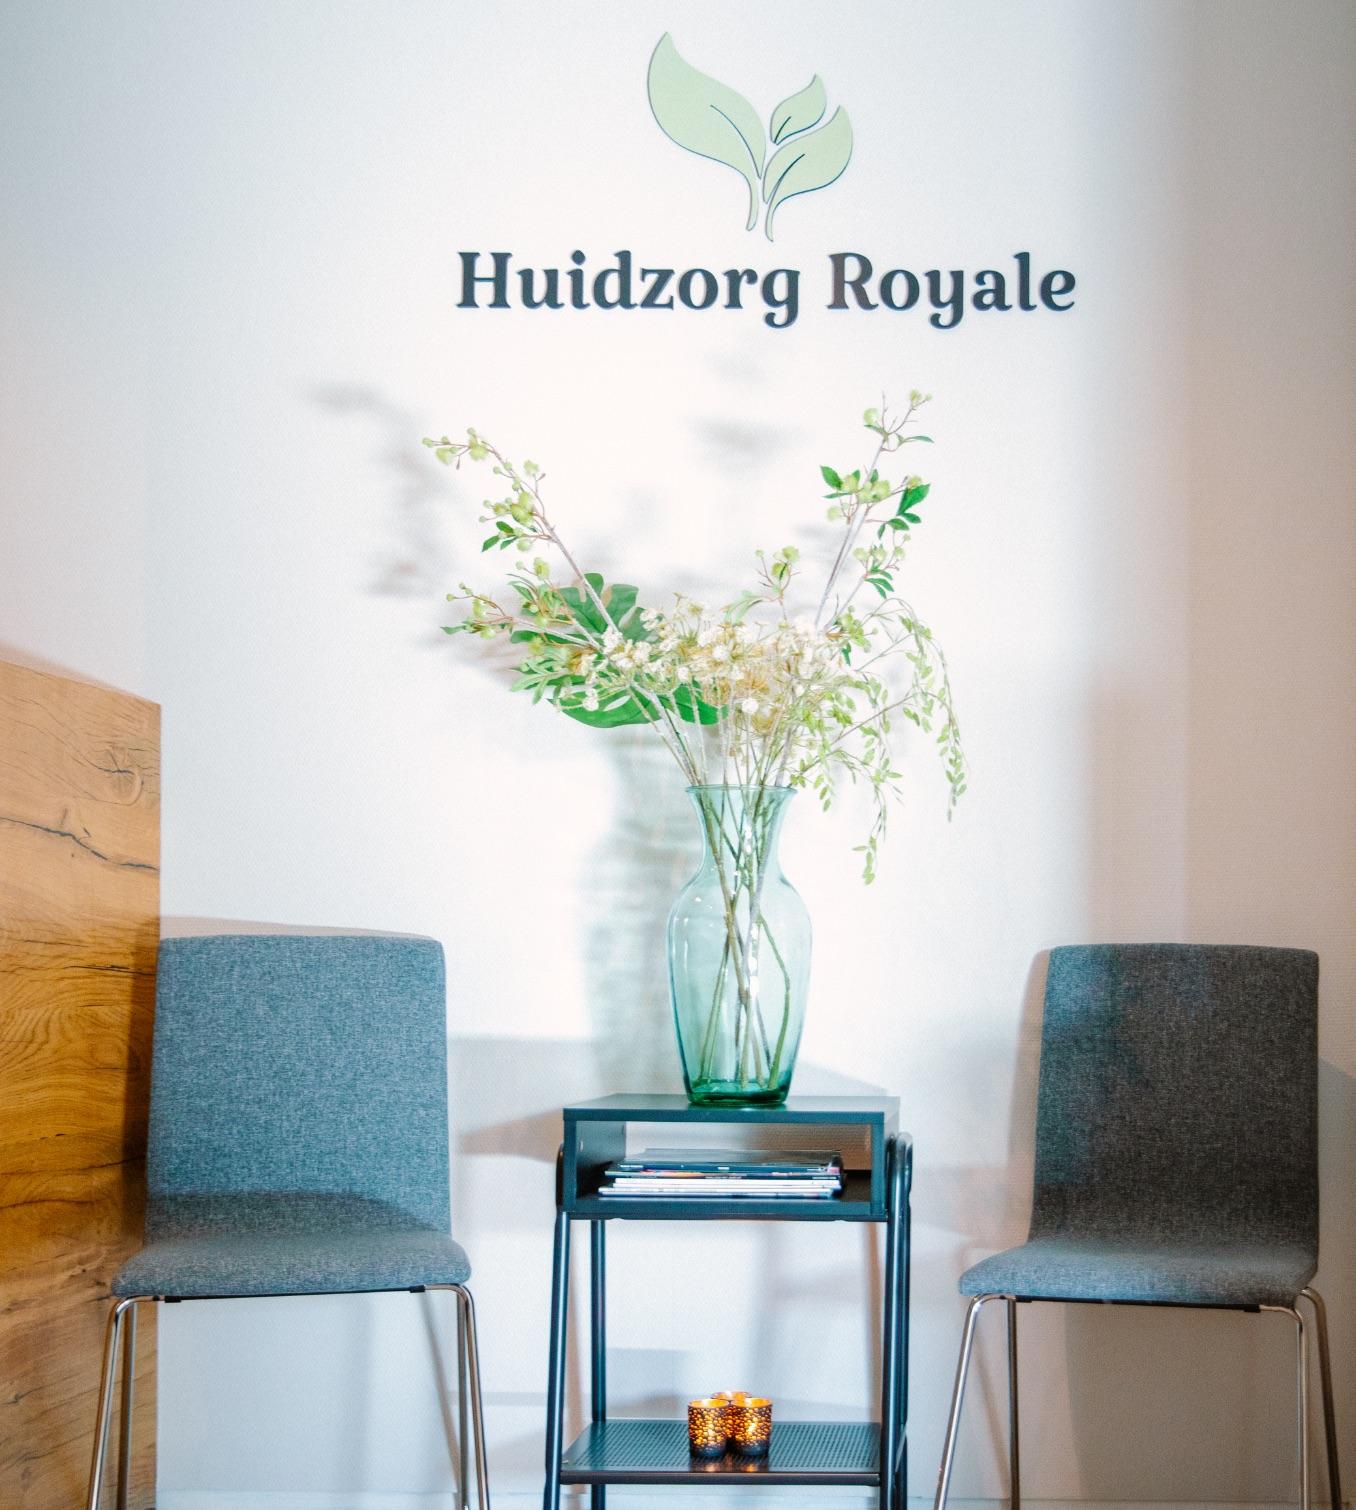 Huidtherapie Royale Leiderdorp